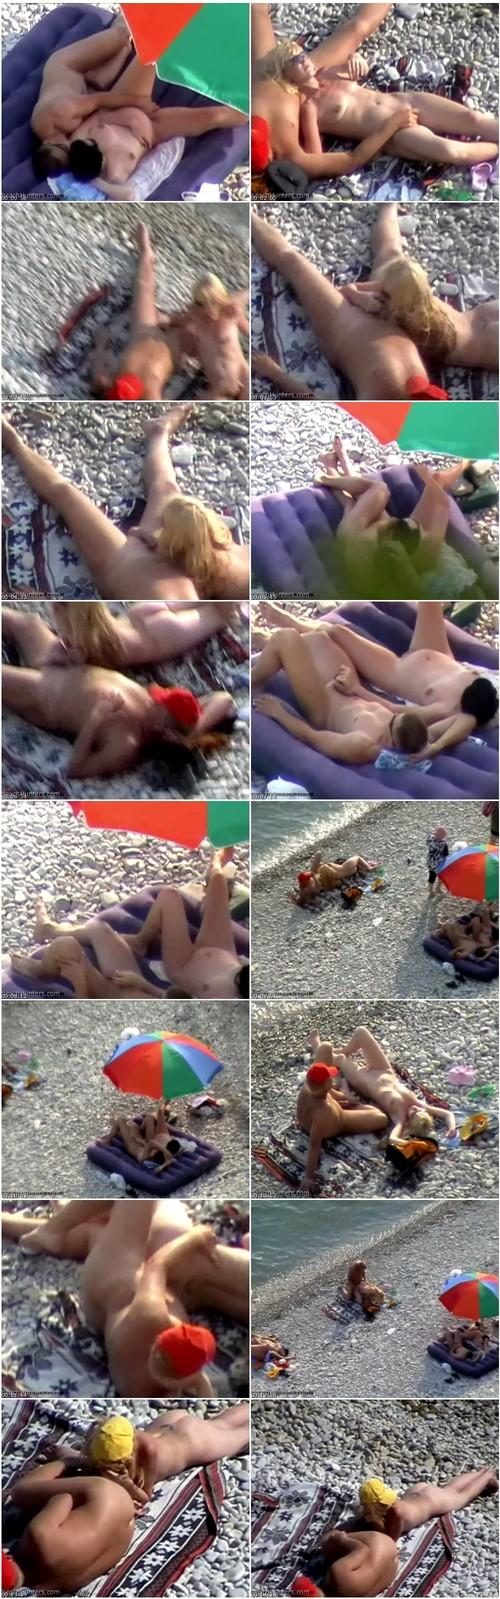 beachhunters-m1133_thumb_m.jpg